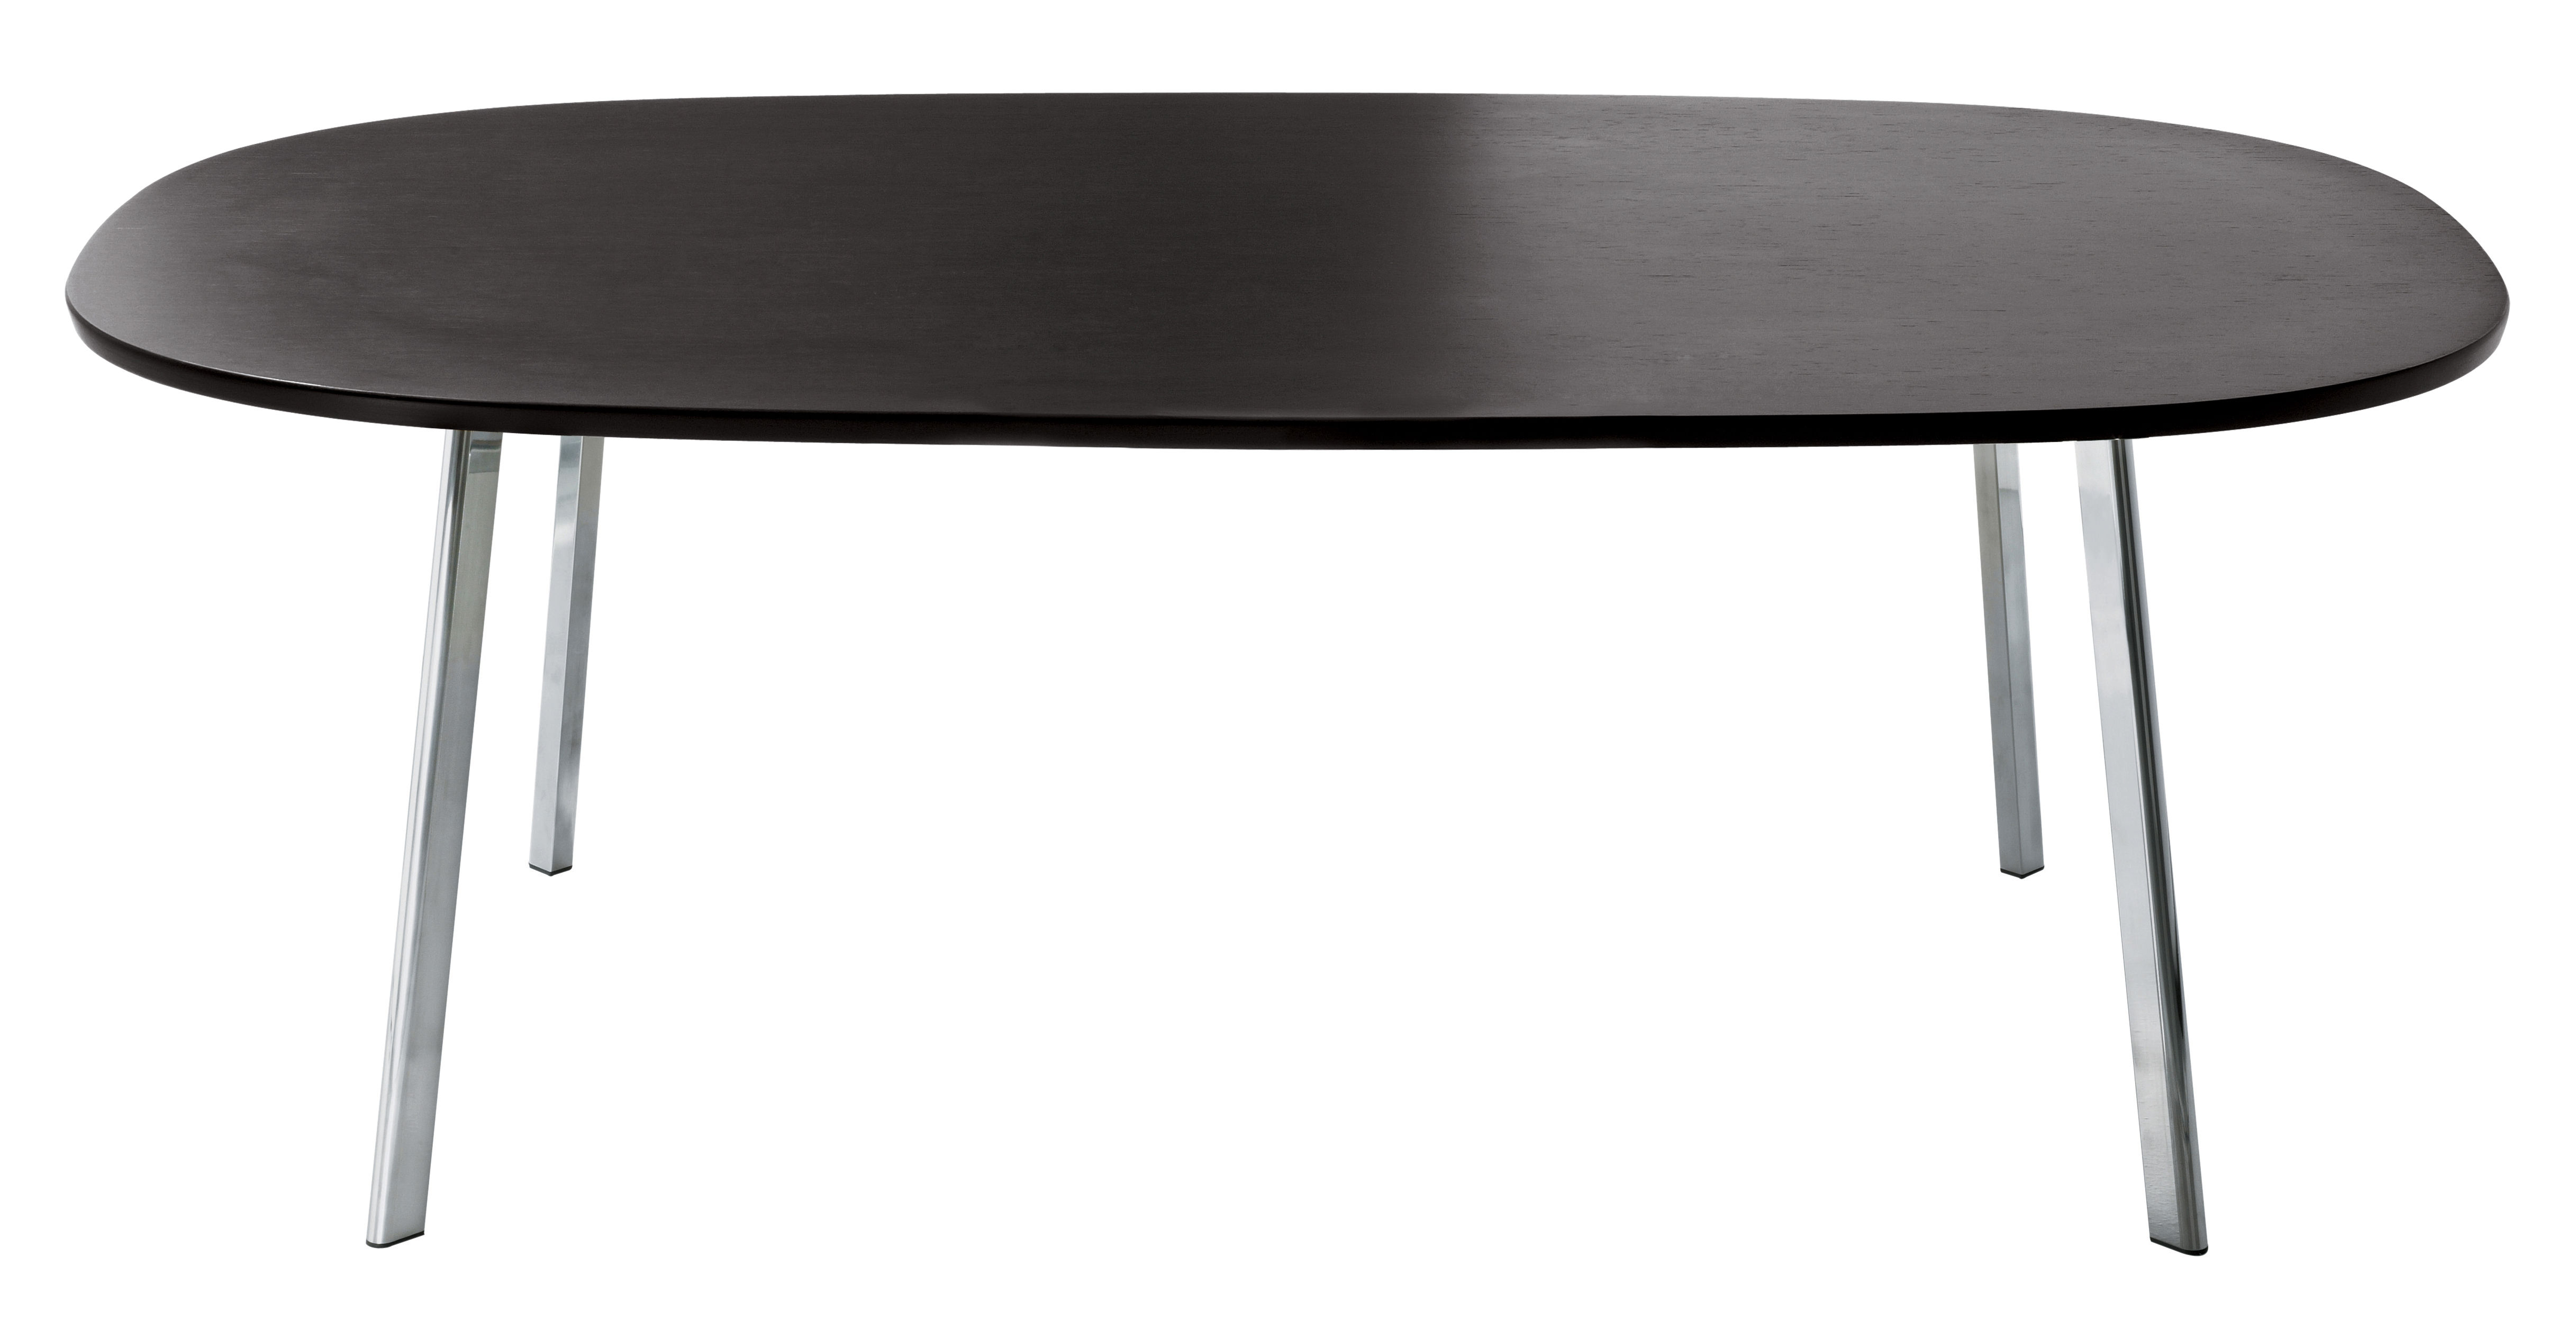 Möbel - Tische - Déjà-vu rechteckiger Tisch 200 cm - Magis - Platte: wenge - MDF plaqué chêne teinté, poliertes Aluminium